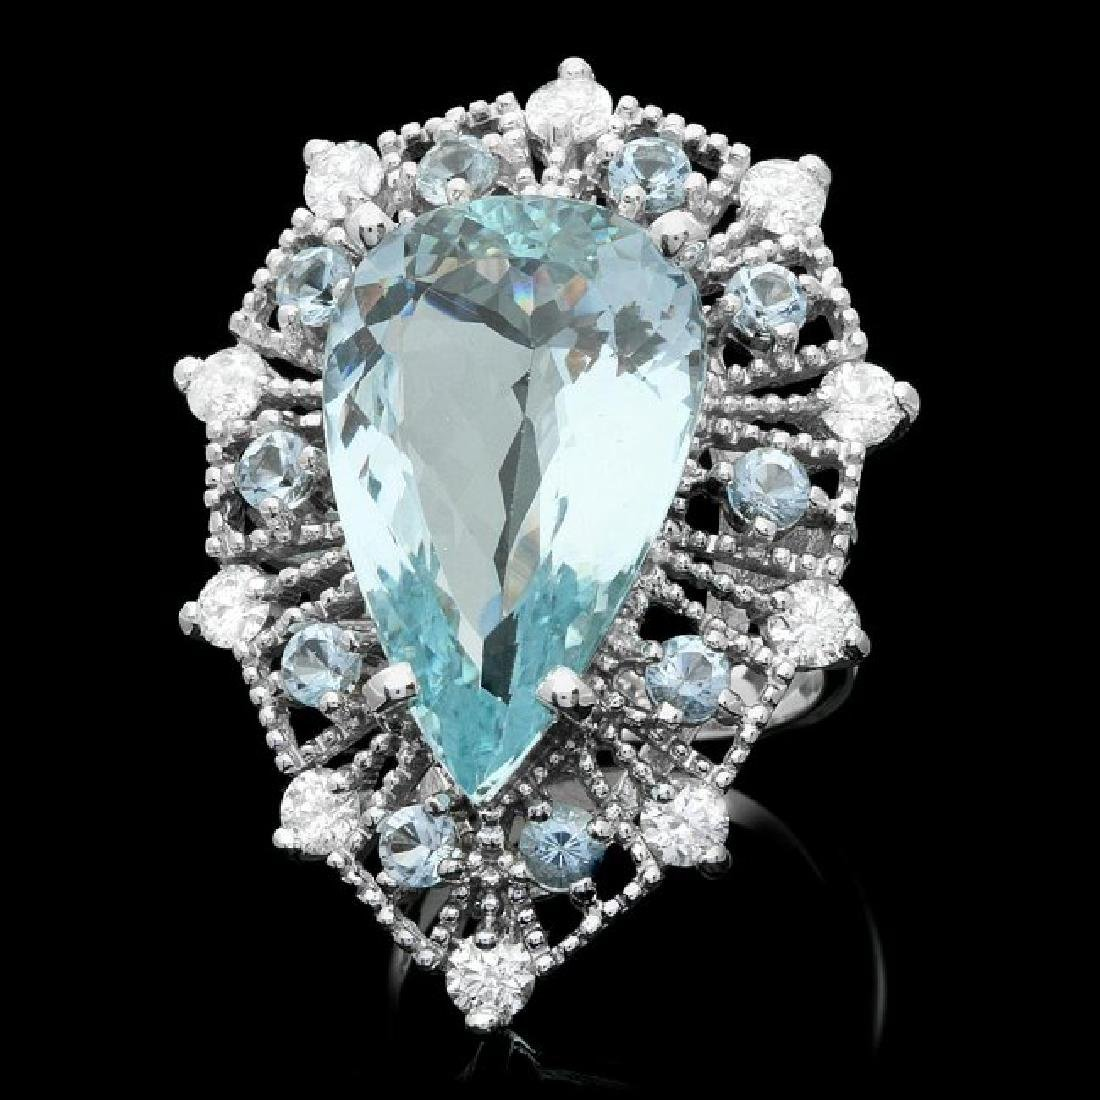 14k Gold 12.5ct Aquamarine 1.25ct Diamond Ring